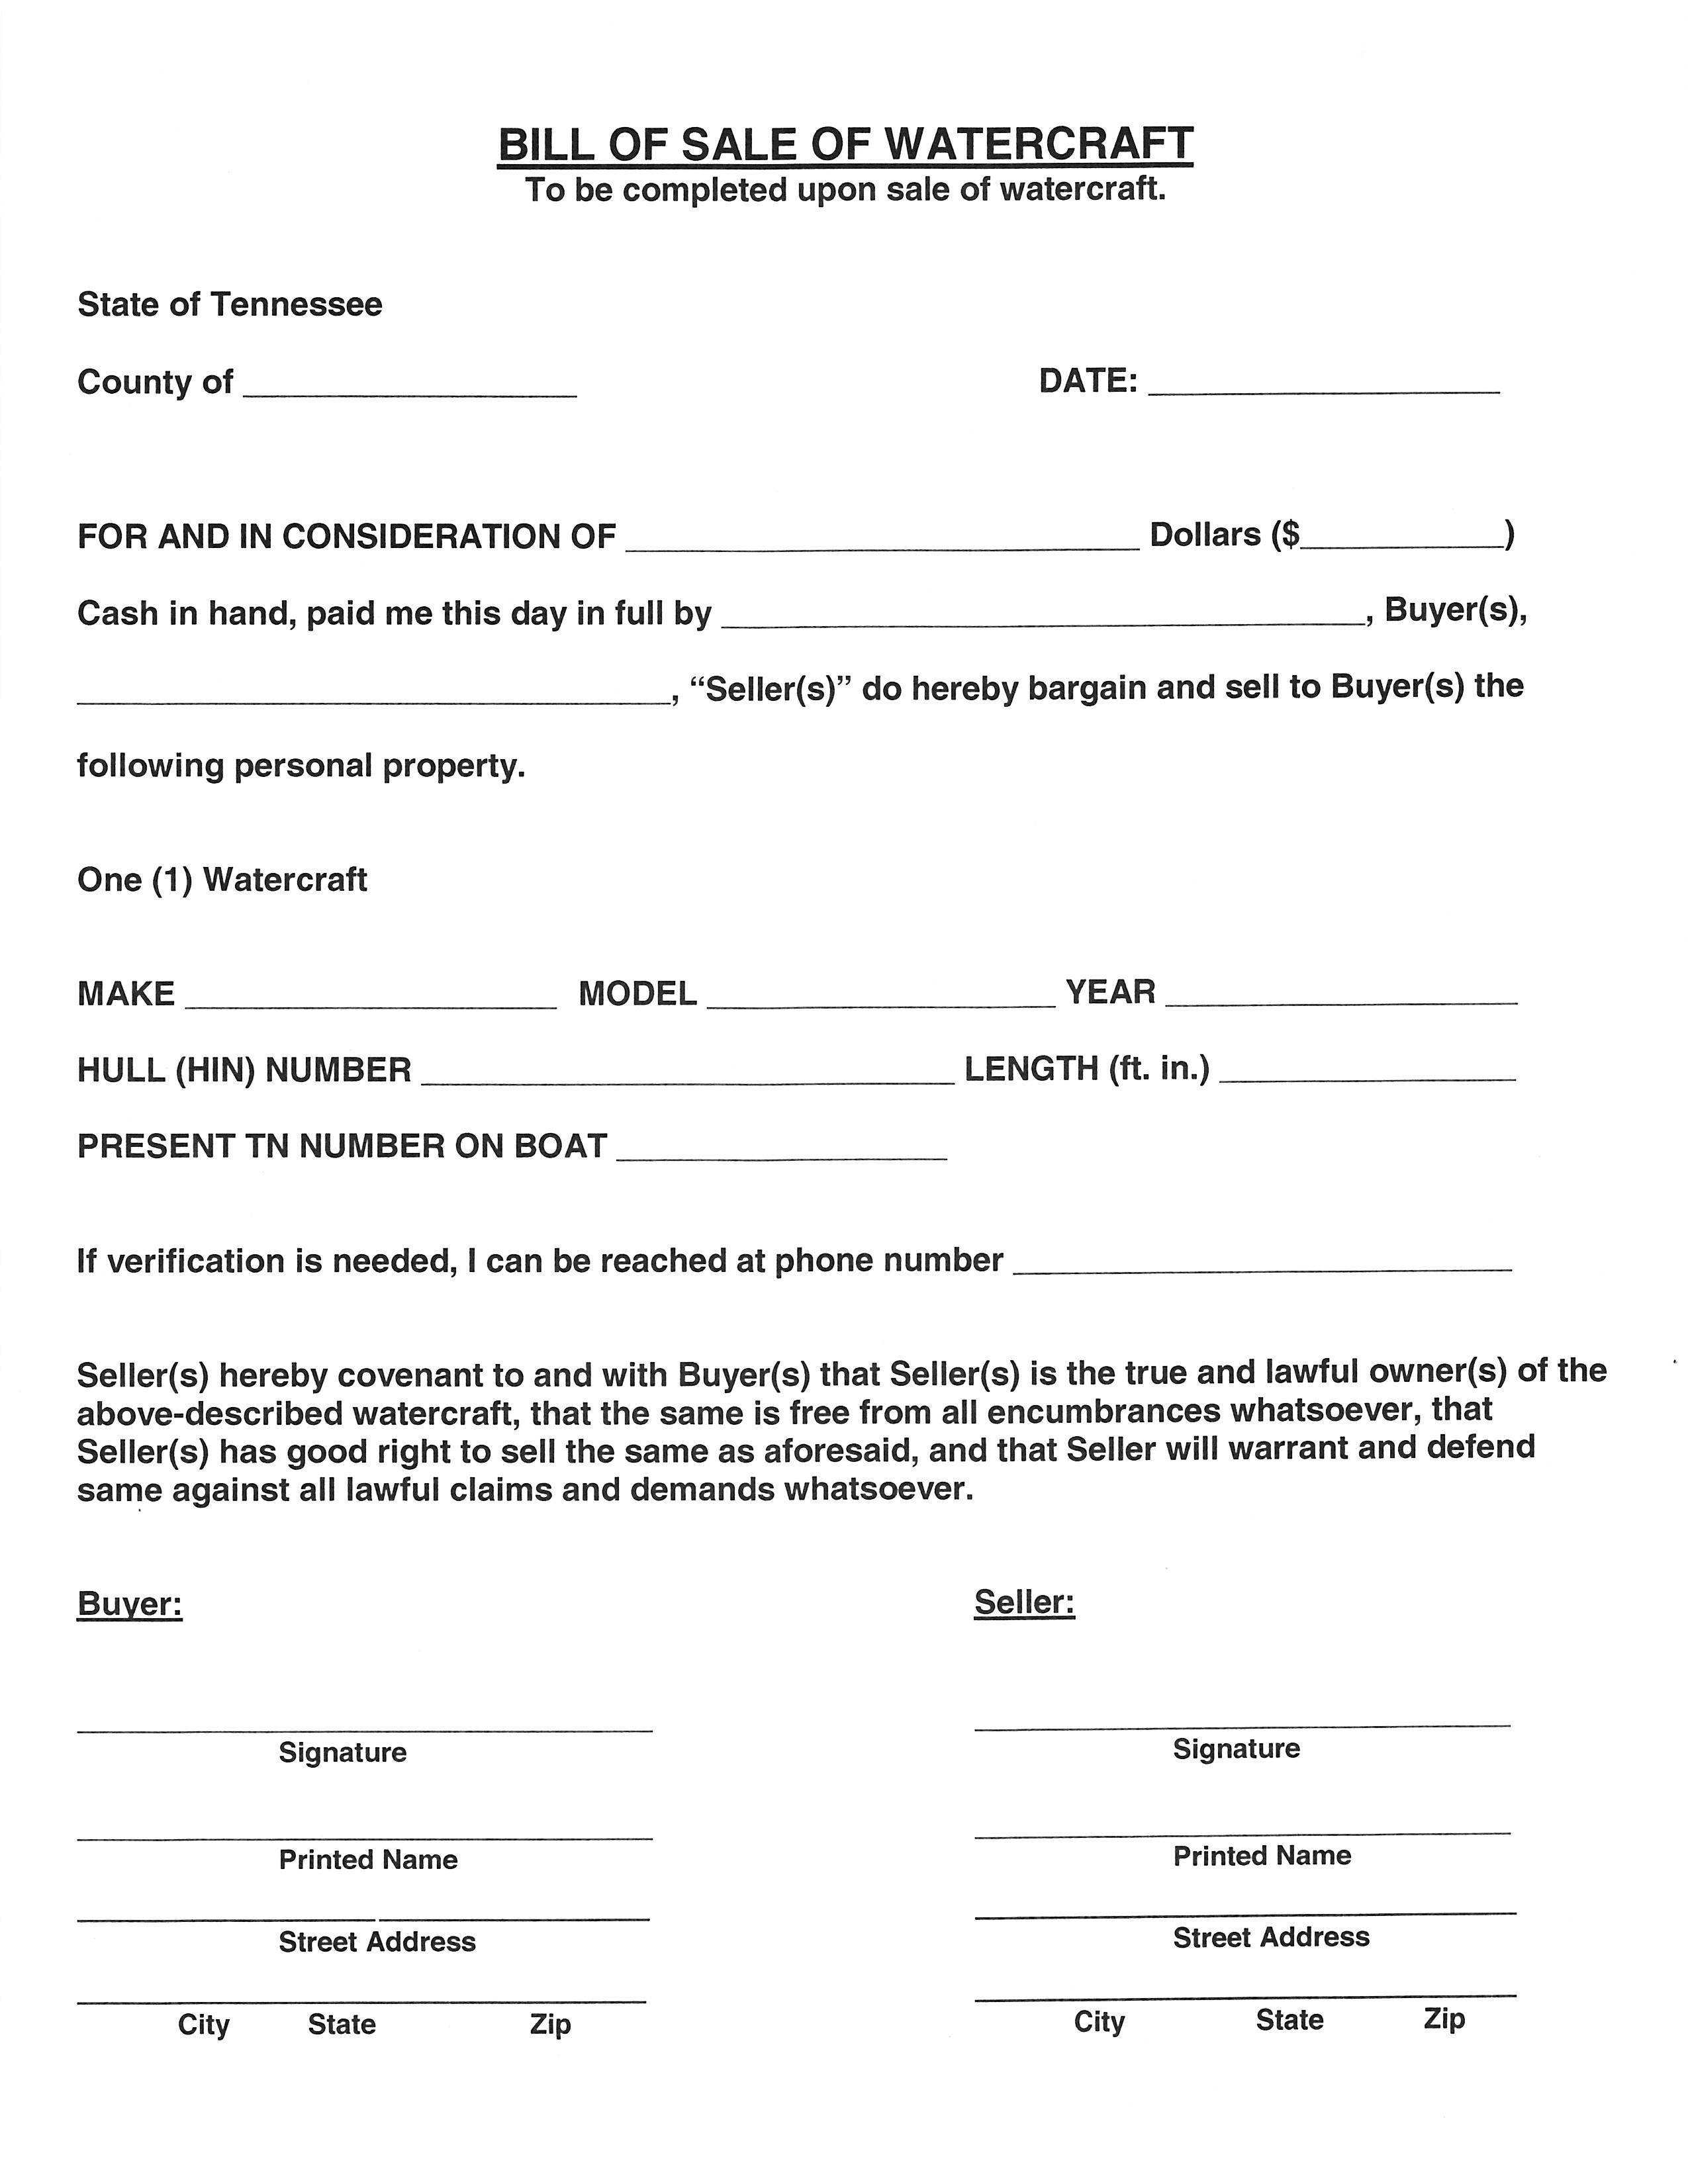 Free Tennessee Watercraft Bill Of Sale Pdf Word Do It Yourself Forms Tennessee bill of sale for trailer